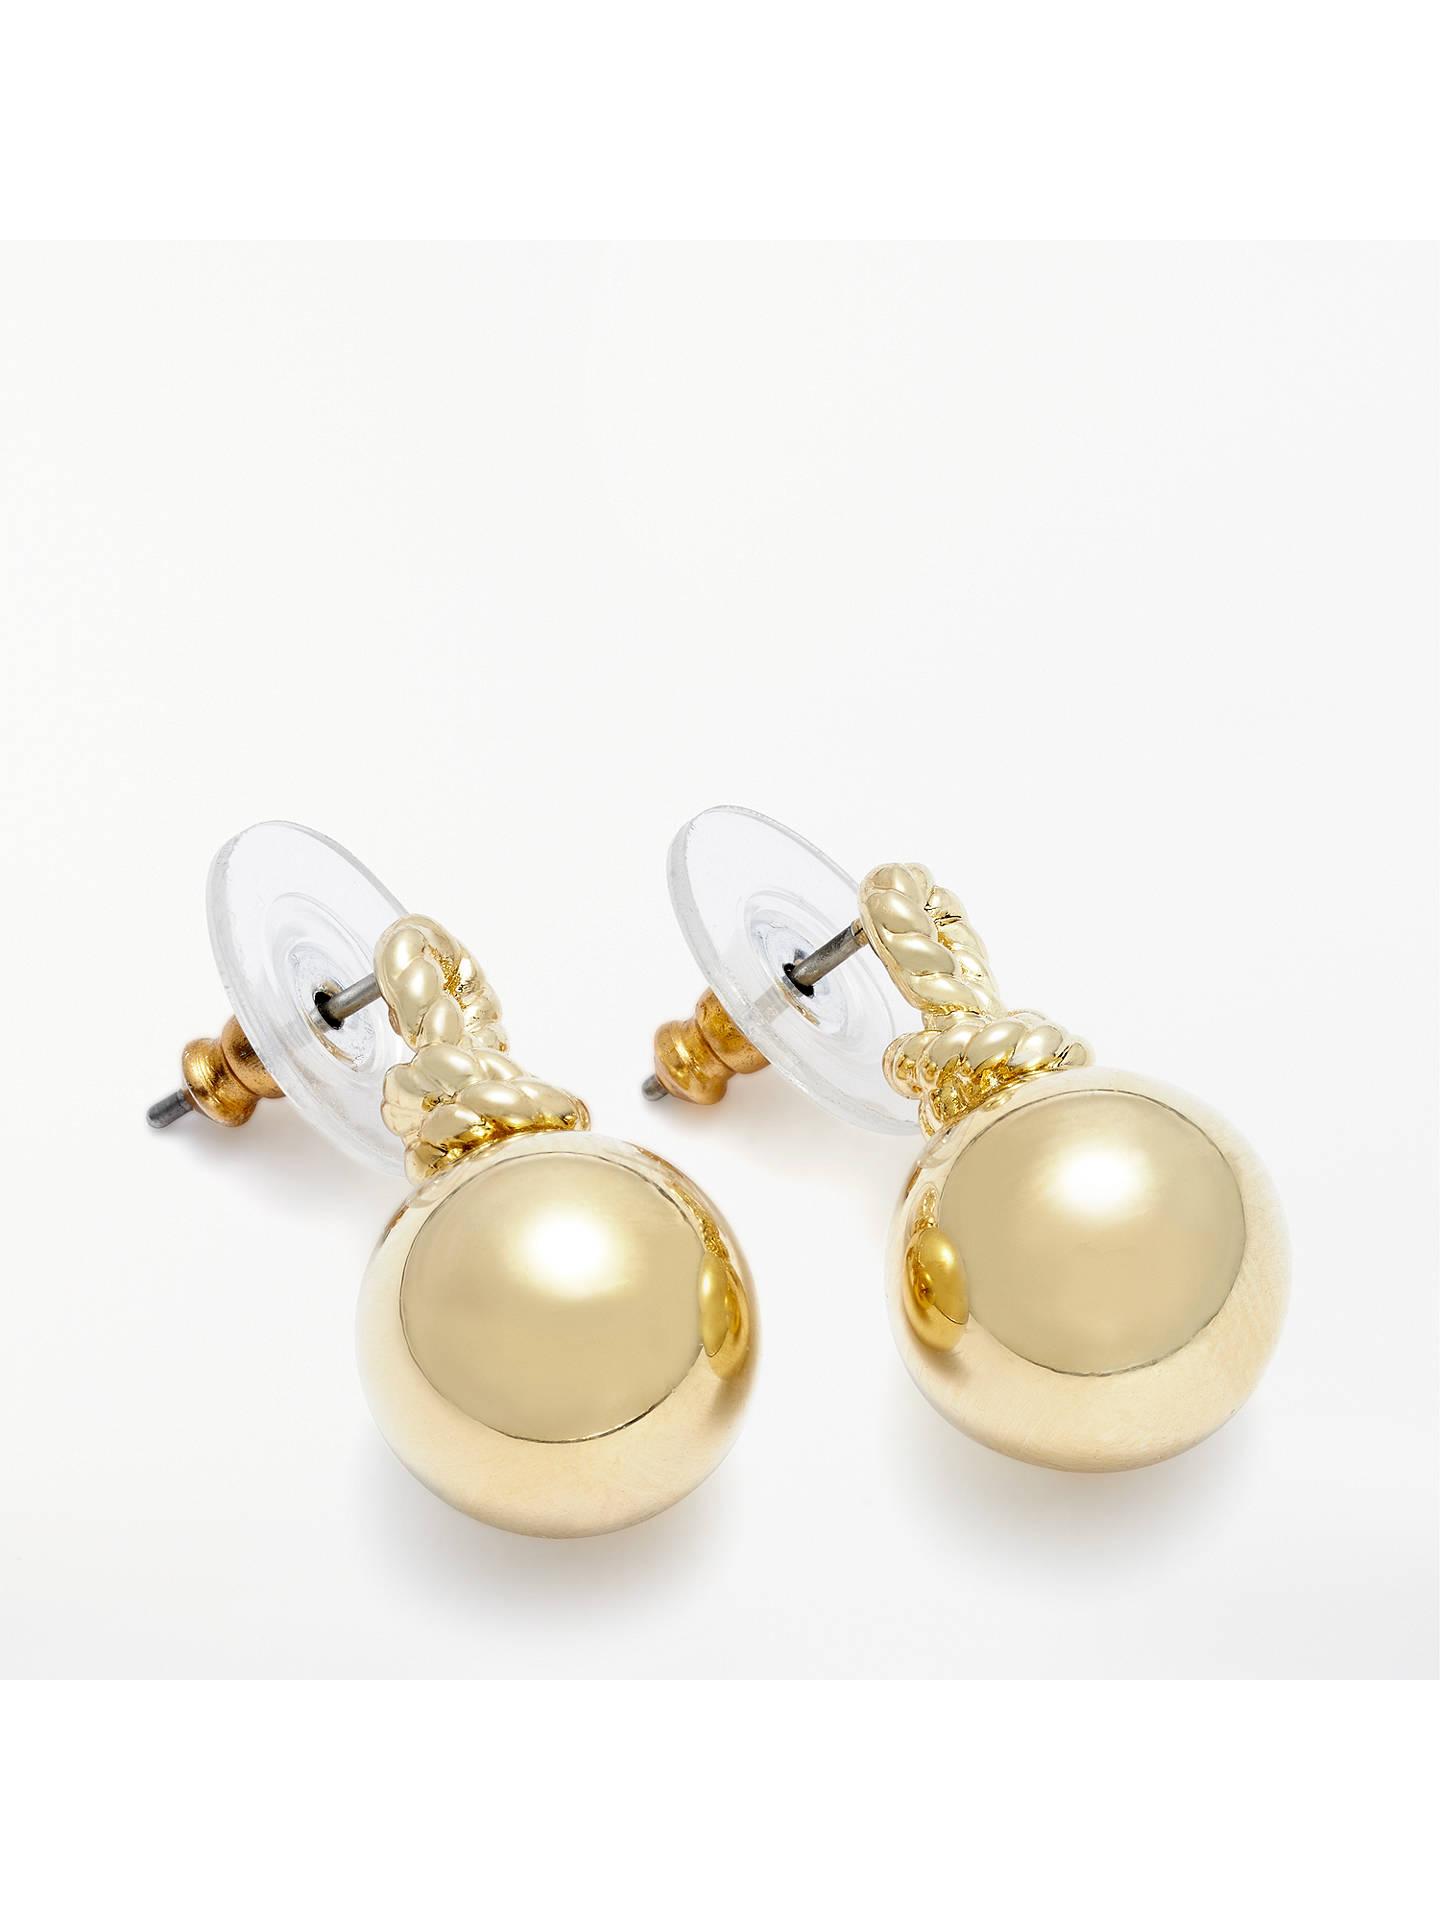 8884d59877731 kate spade new york Mini Ball Drop Earrings, Gold